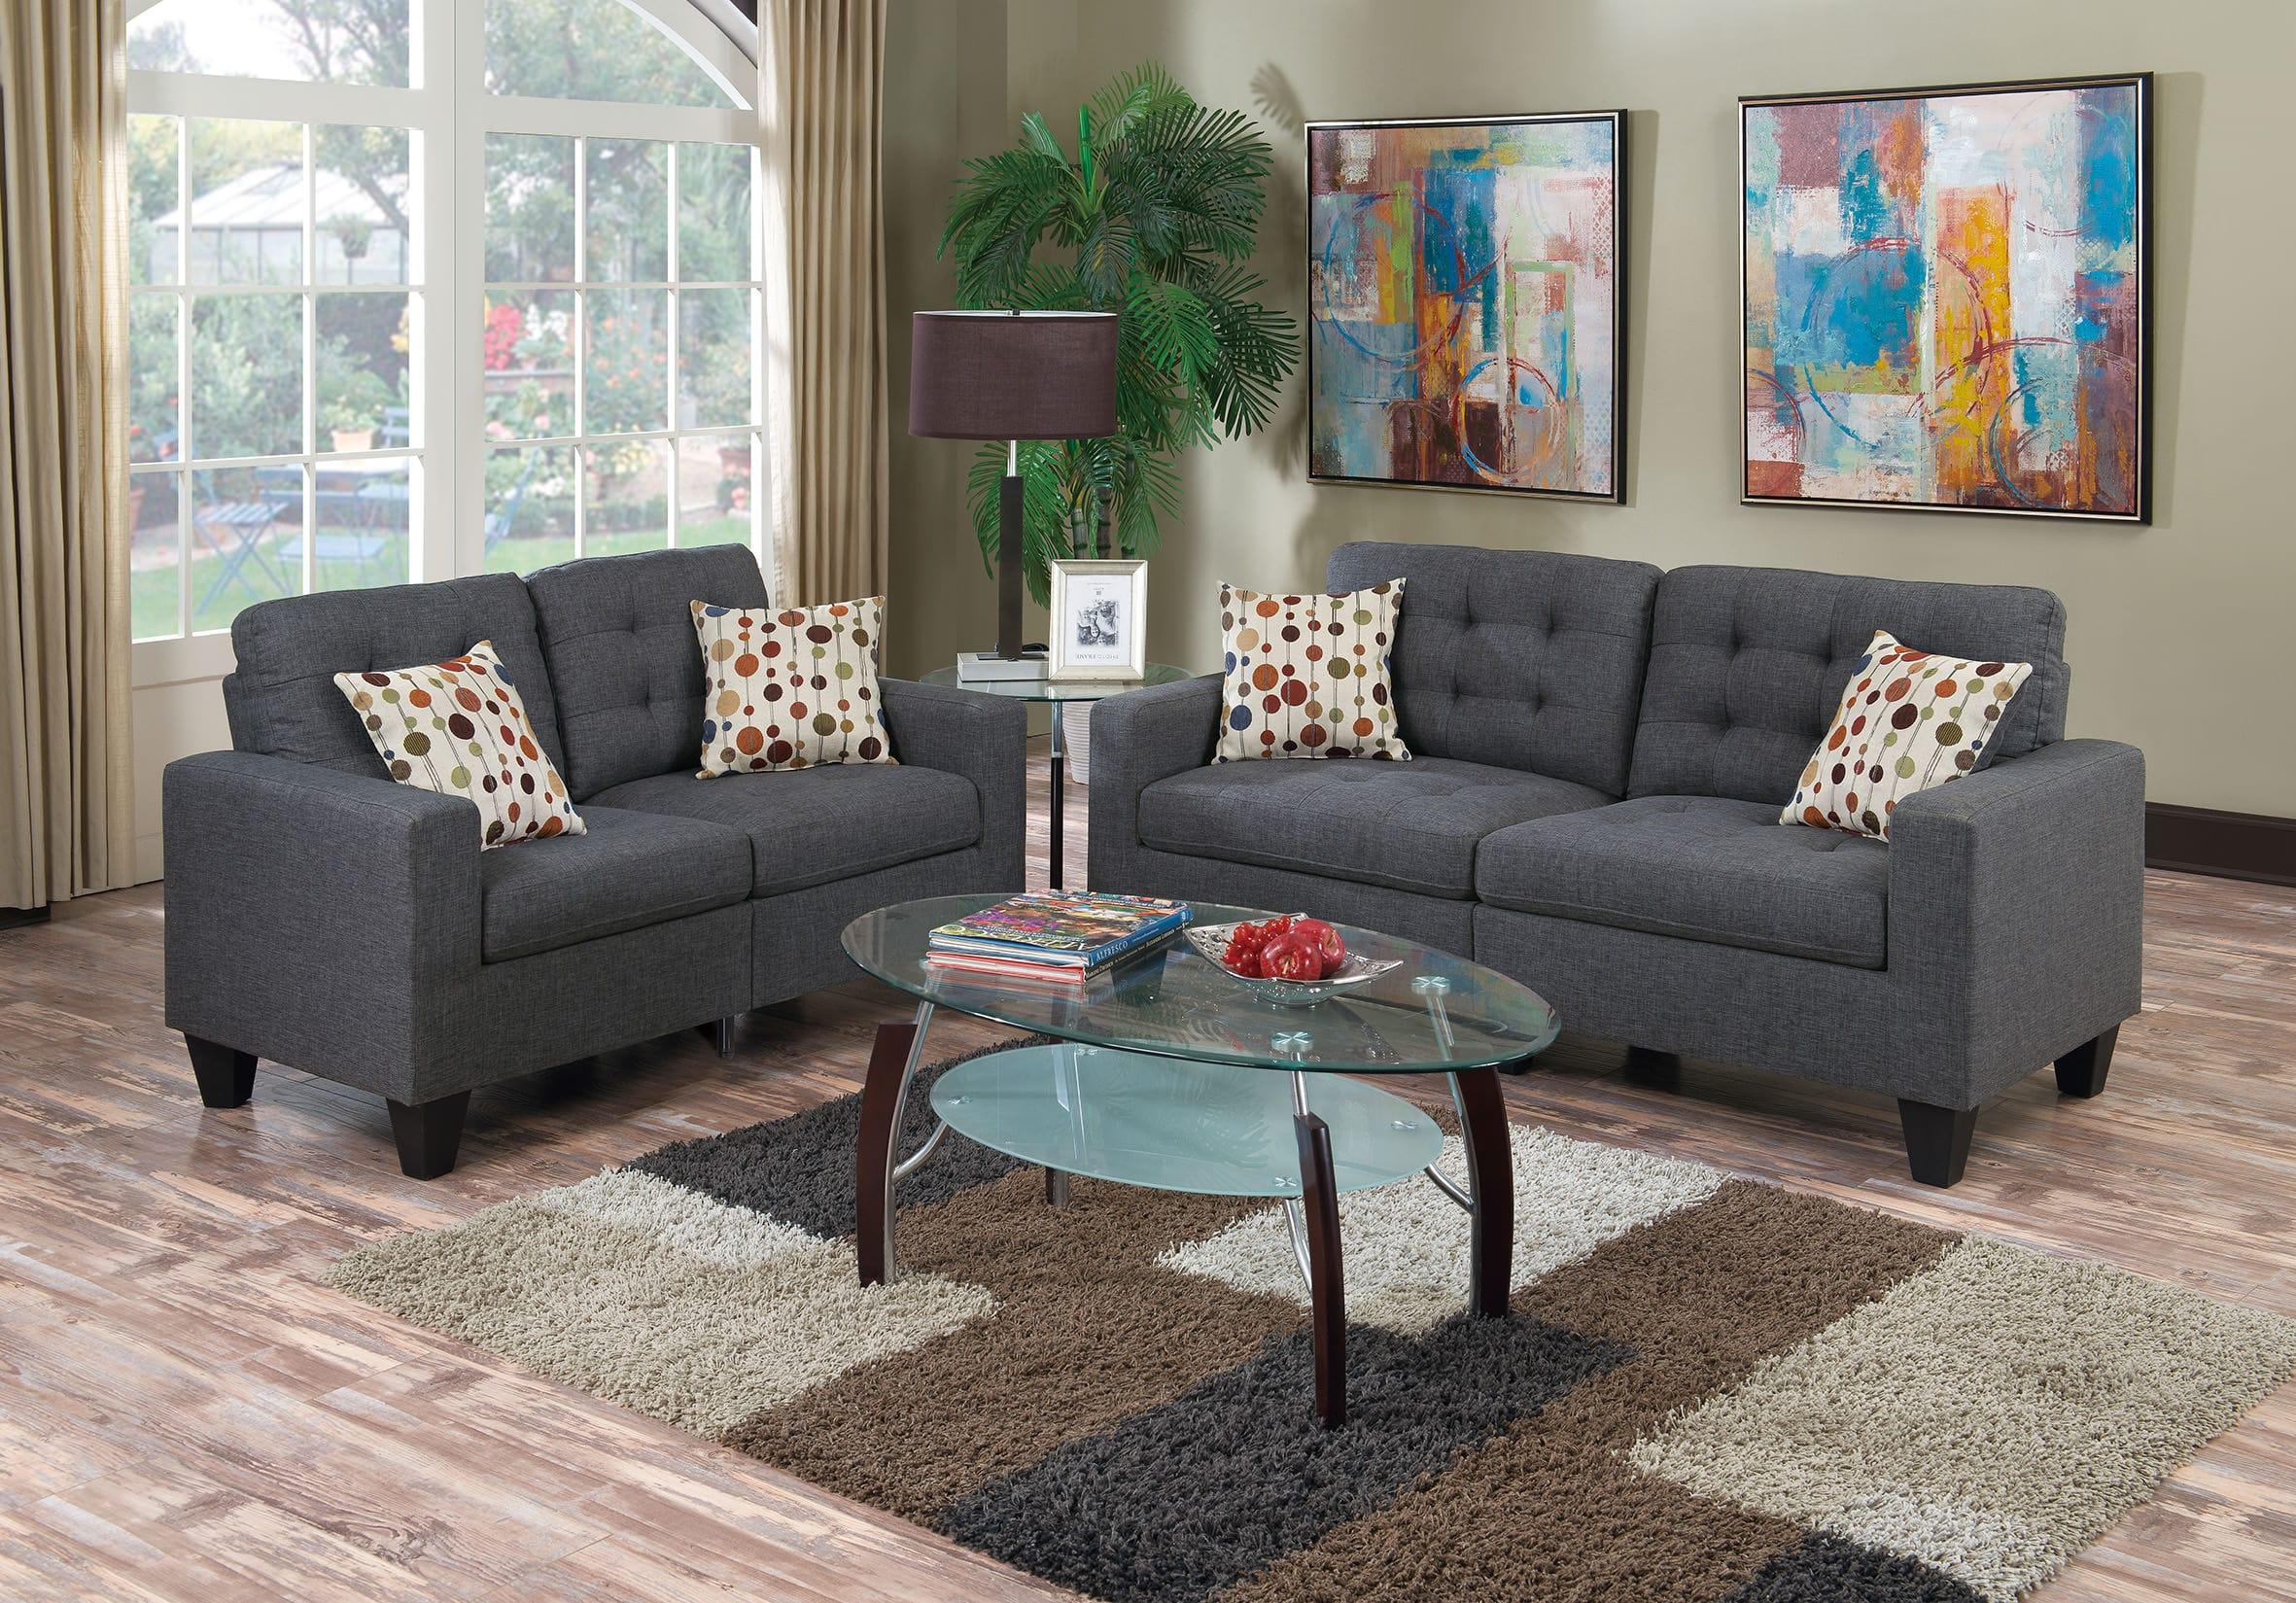 F6901 Blue Gray 2 Pcs Sofa Set by Poundex